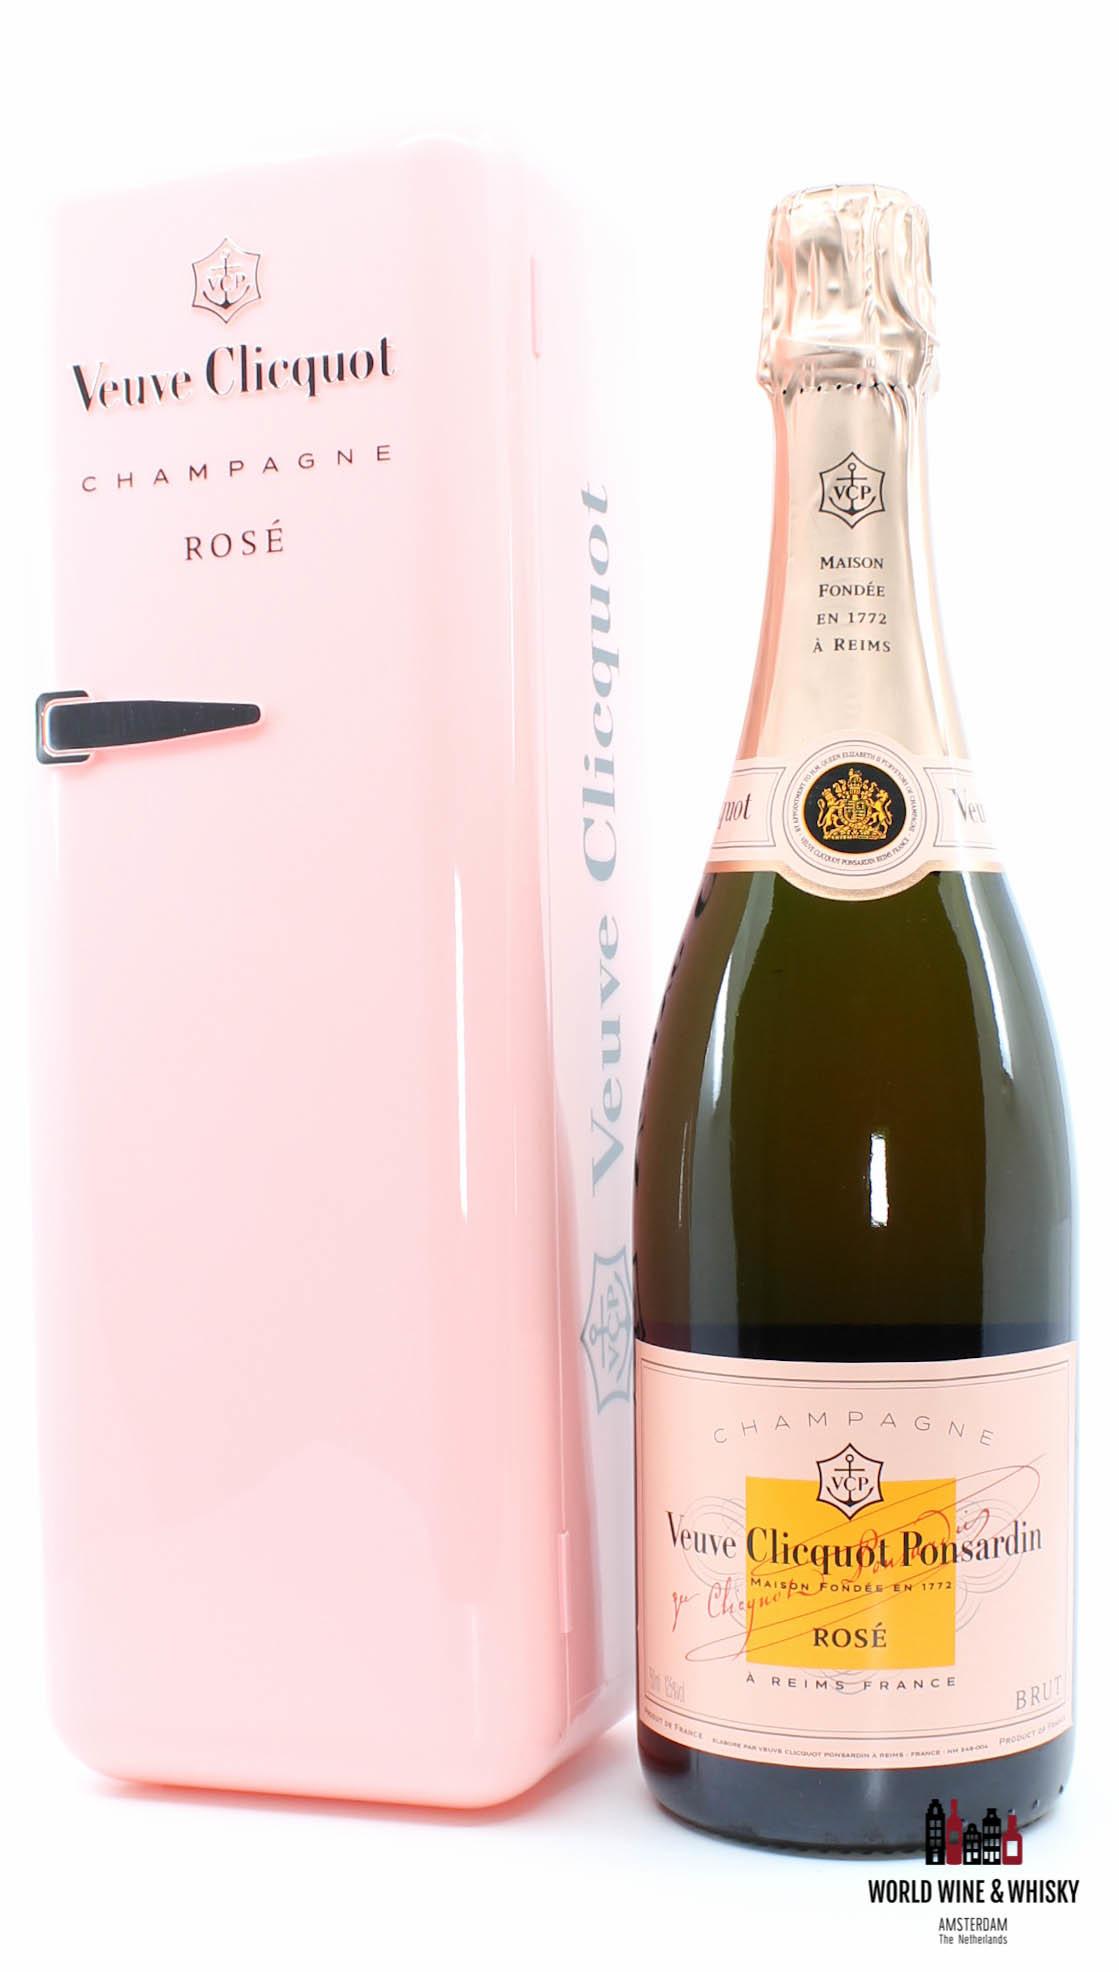 Veuve Clicquot Veuve Clicquot Champagne Brut - in Rose (pink) fridge